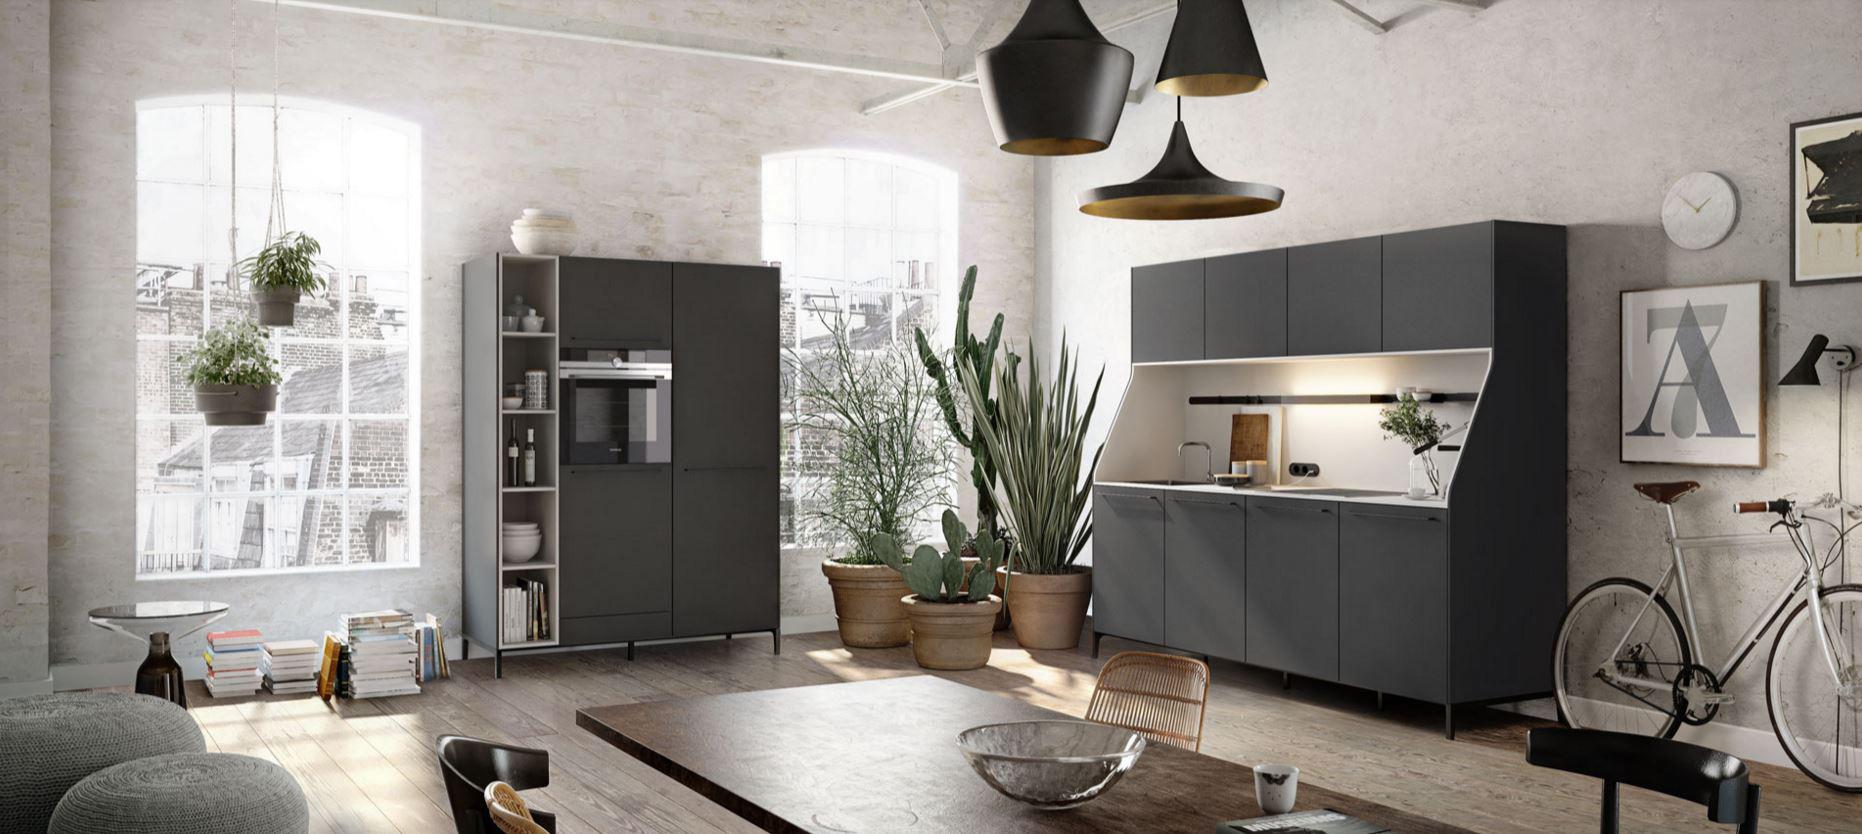 cuisiniste besancon cool cuisine schmidt besancon beautiful cuisine plus la valette beau. Black Bedroom Furniture Sets. Home Design Ideas